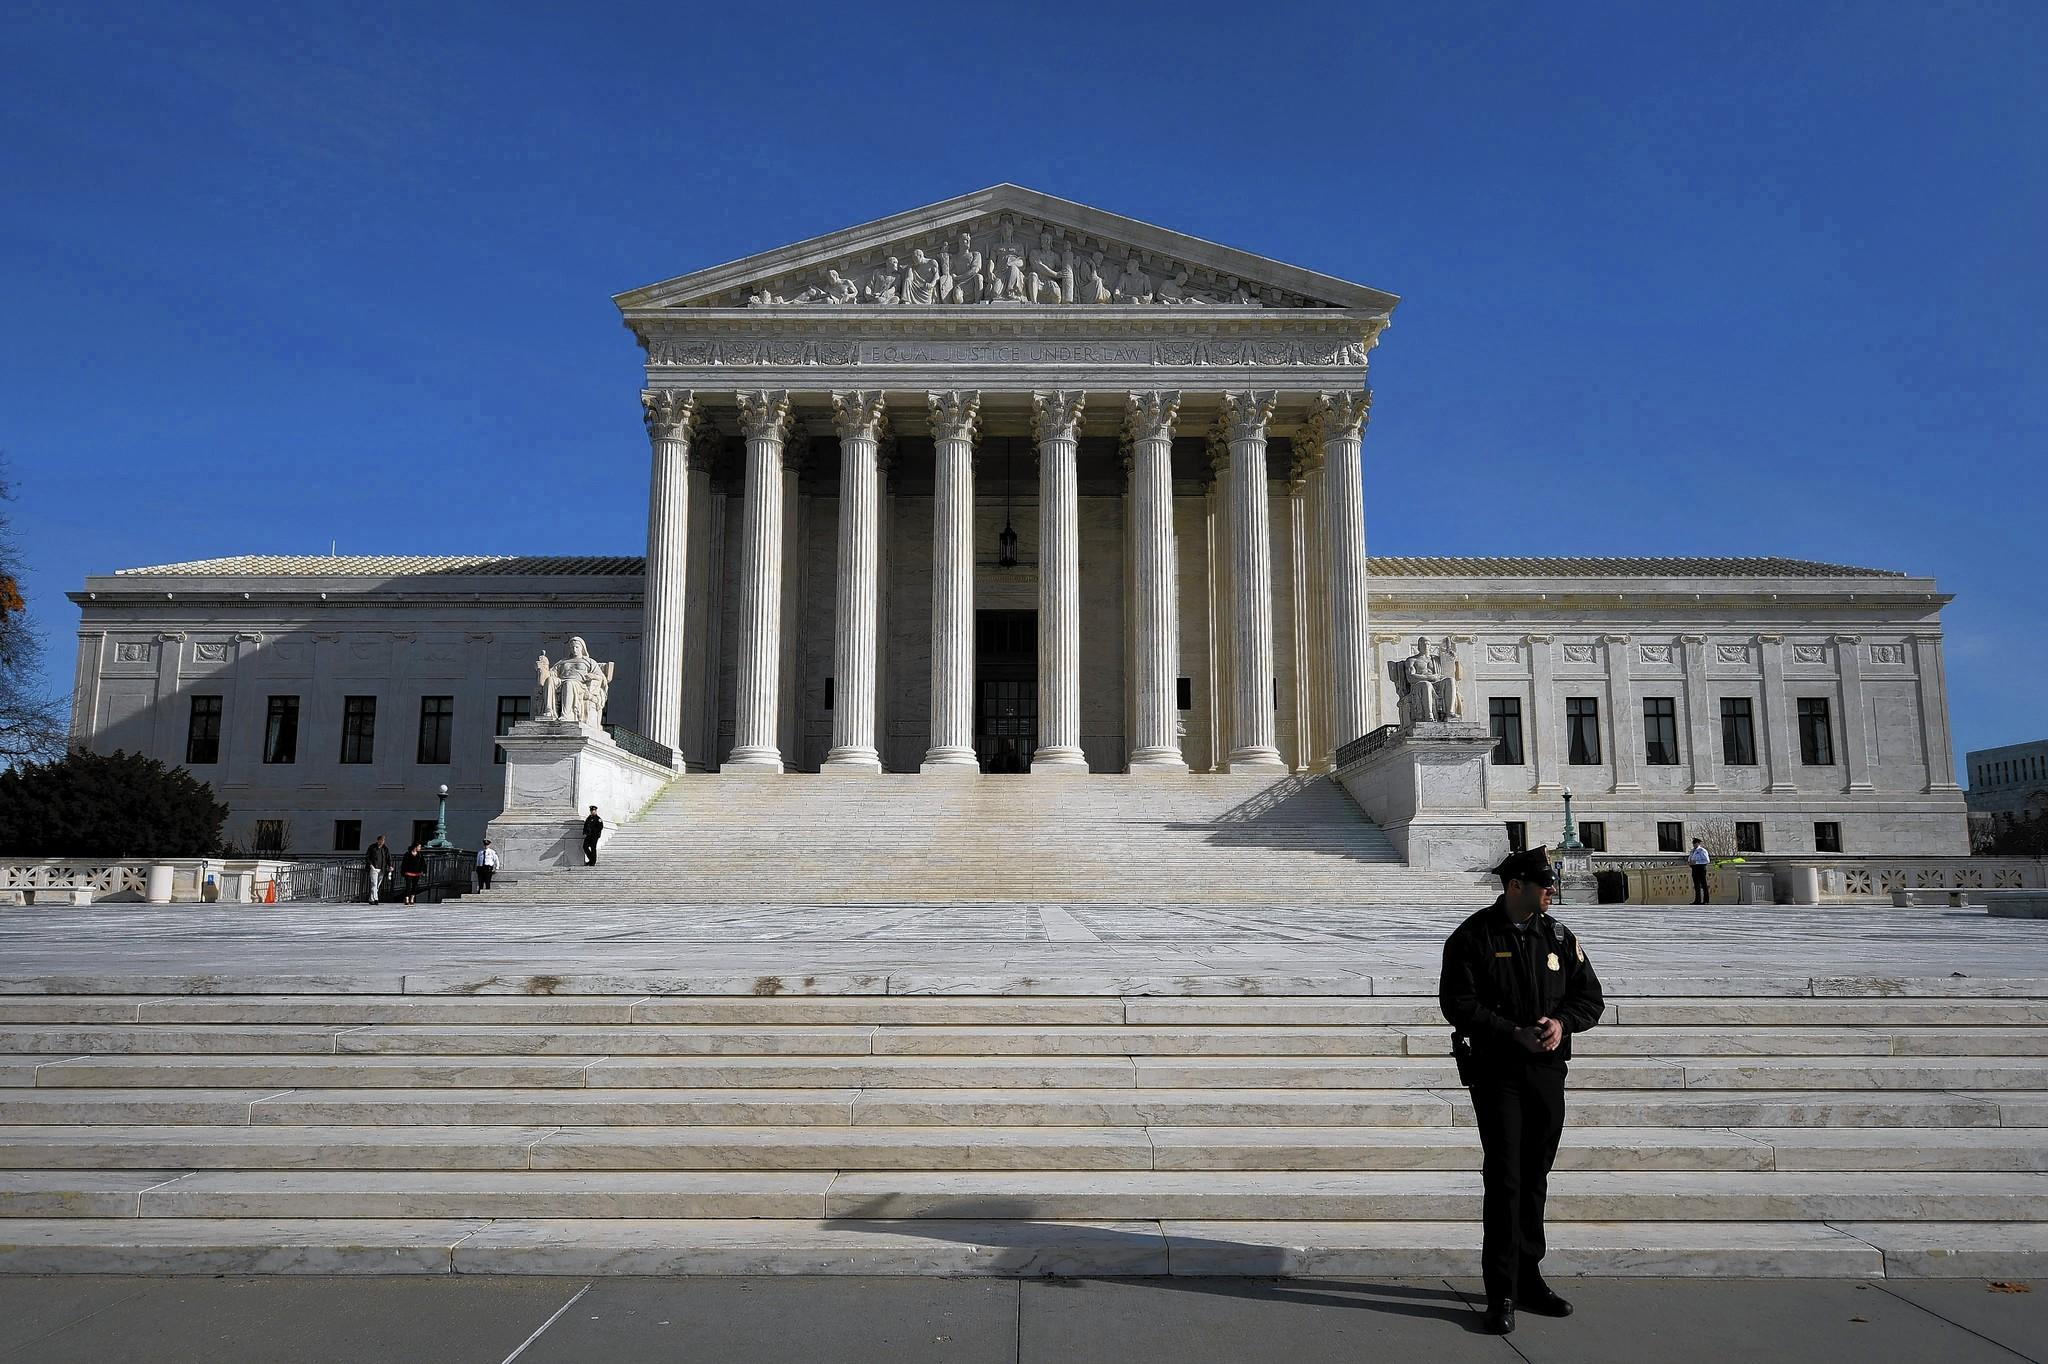 Comments on 'Supreme Court to hear Arizona redistricting case'  |Arizona State Supreme Court